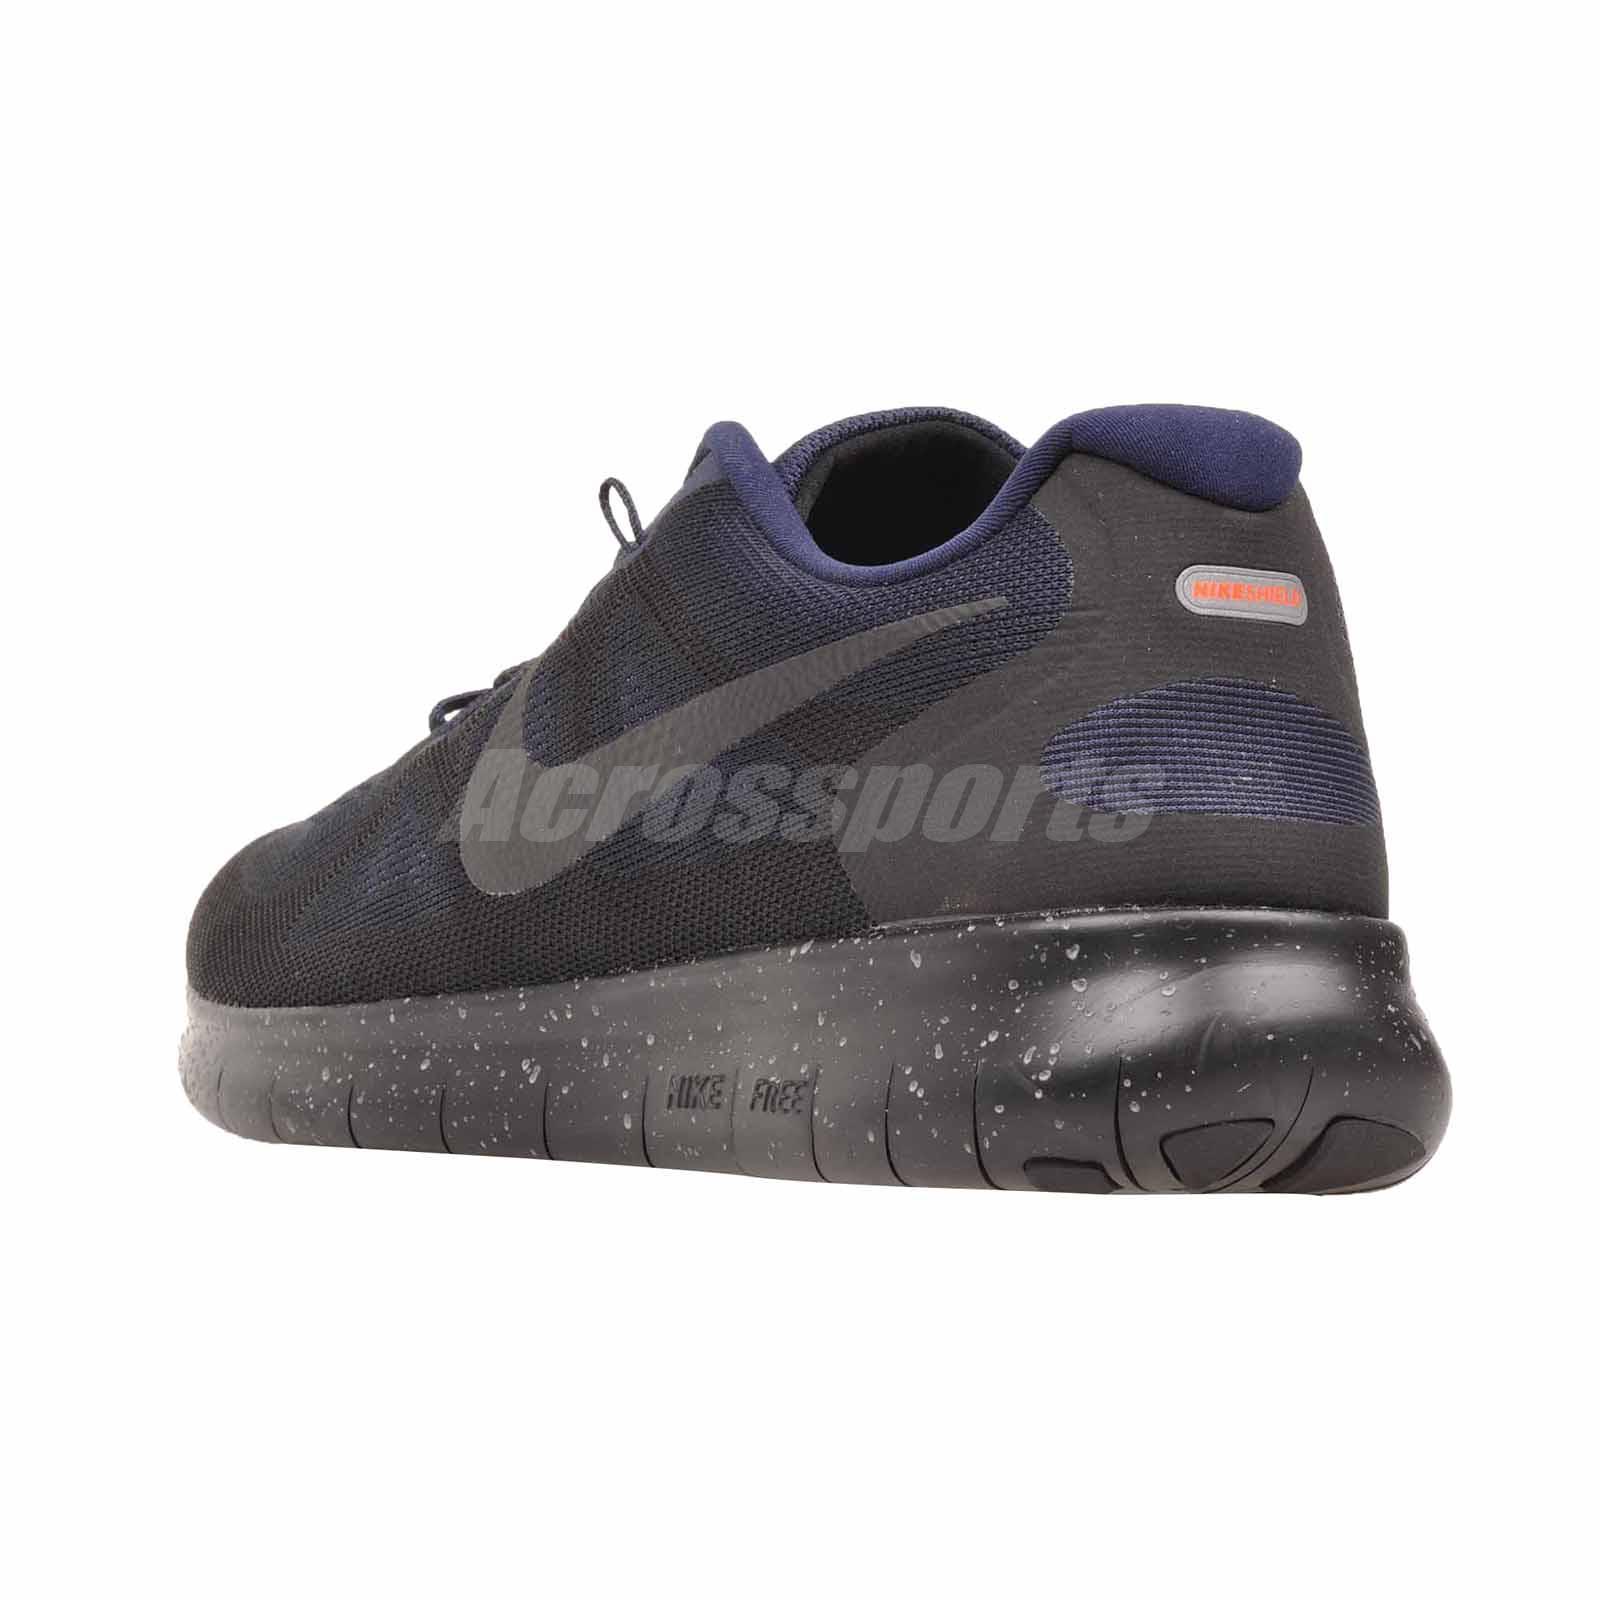 22dde1cfb9d22c Nike Free RN 2017 Shield Running Mens Shoes NWOB Black AA3760-001